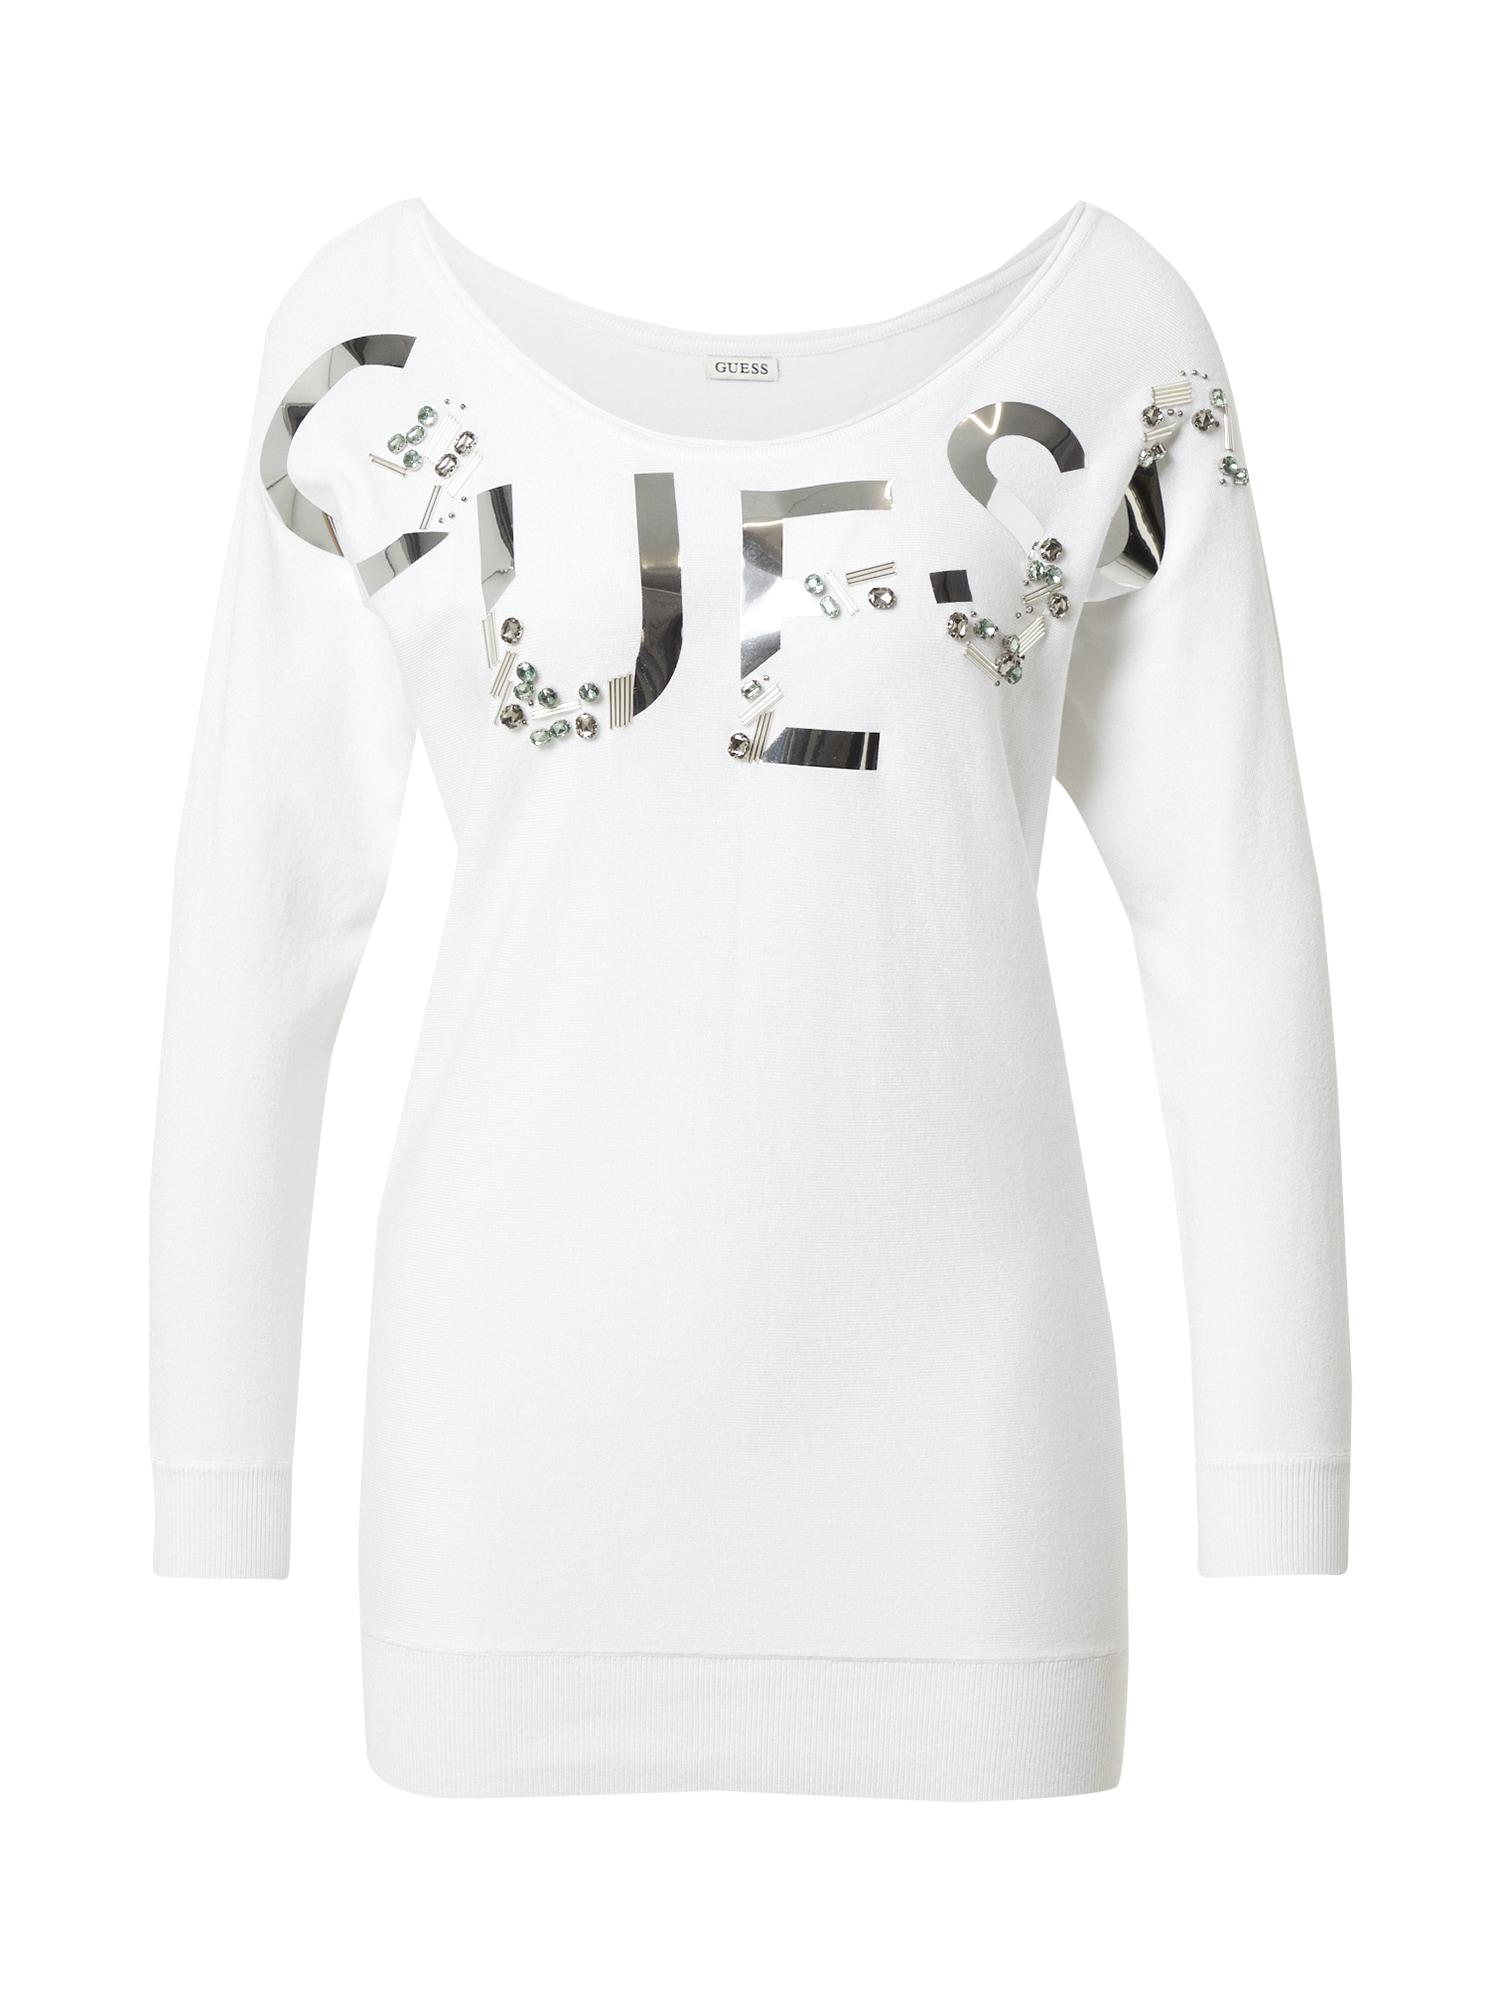 GUESS Megztinis 'DORIS' balta / sidabrinė